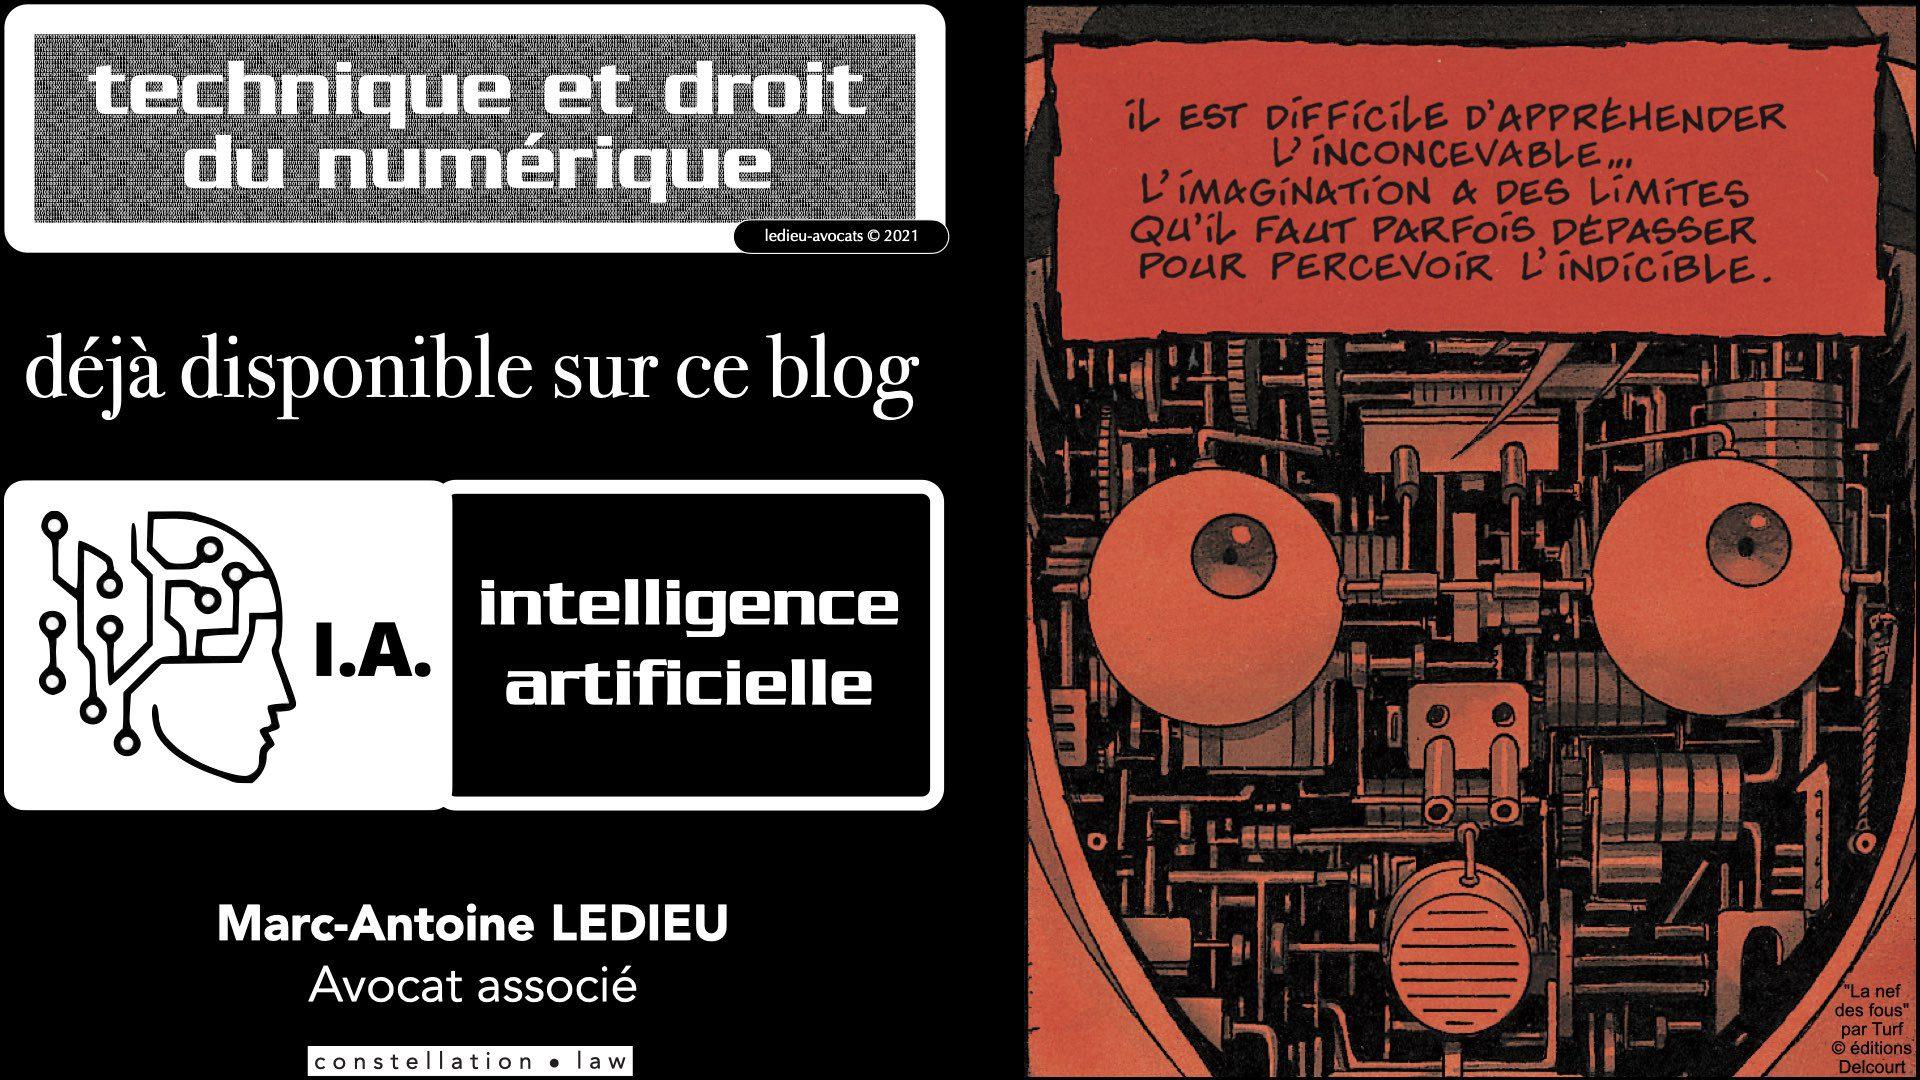 service LOGICIEL SaaS 2021 : IA deep learning machine learning pour aller plus loin